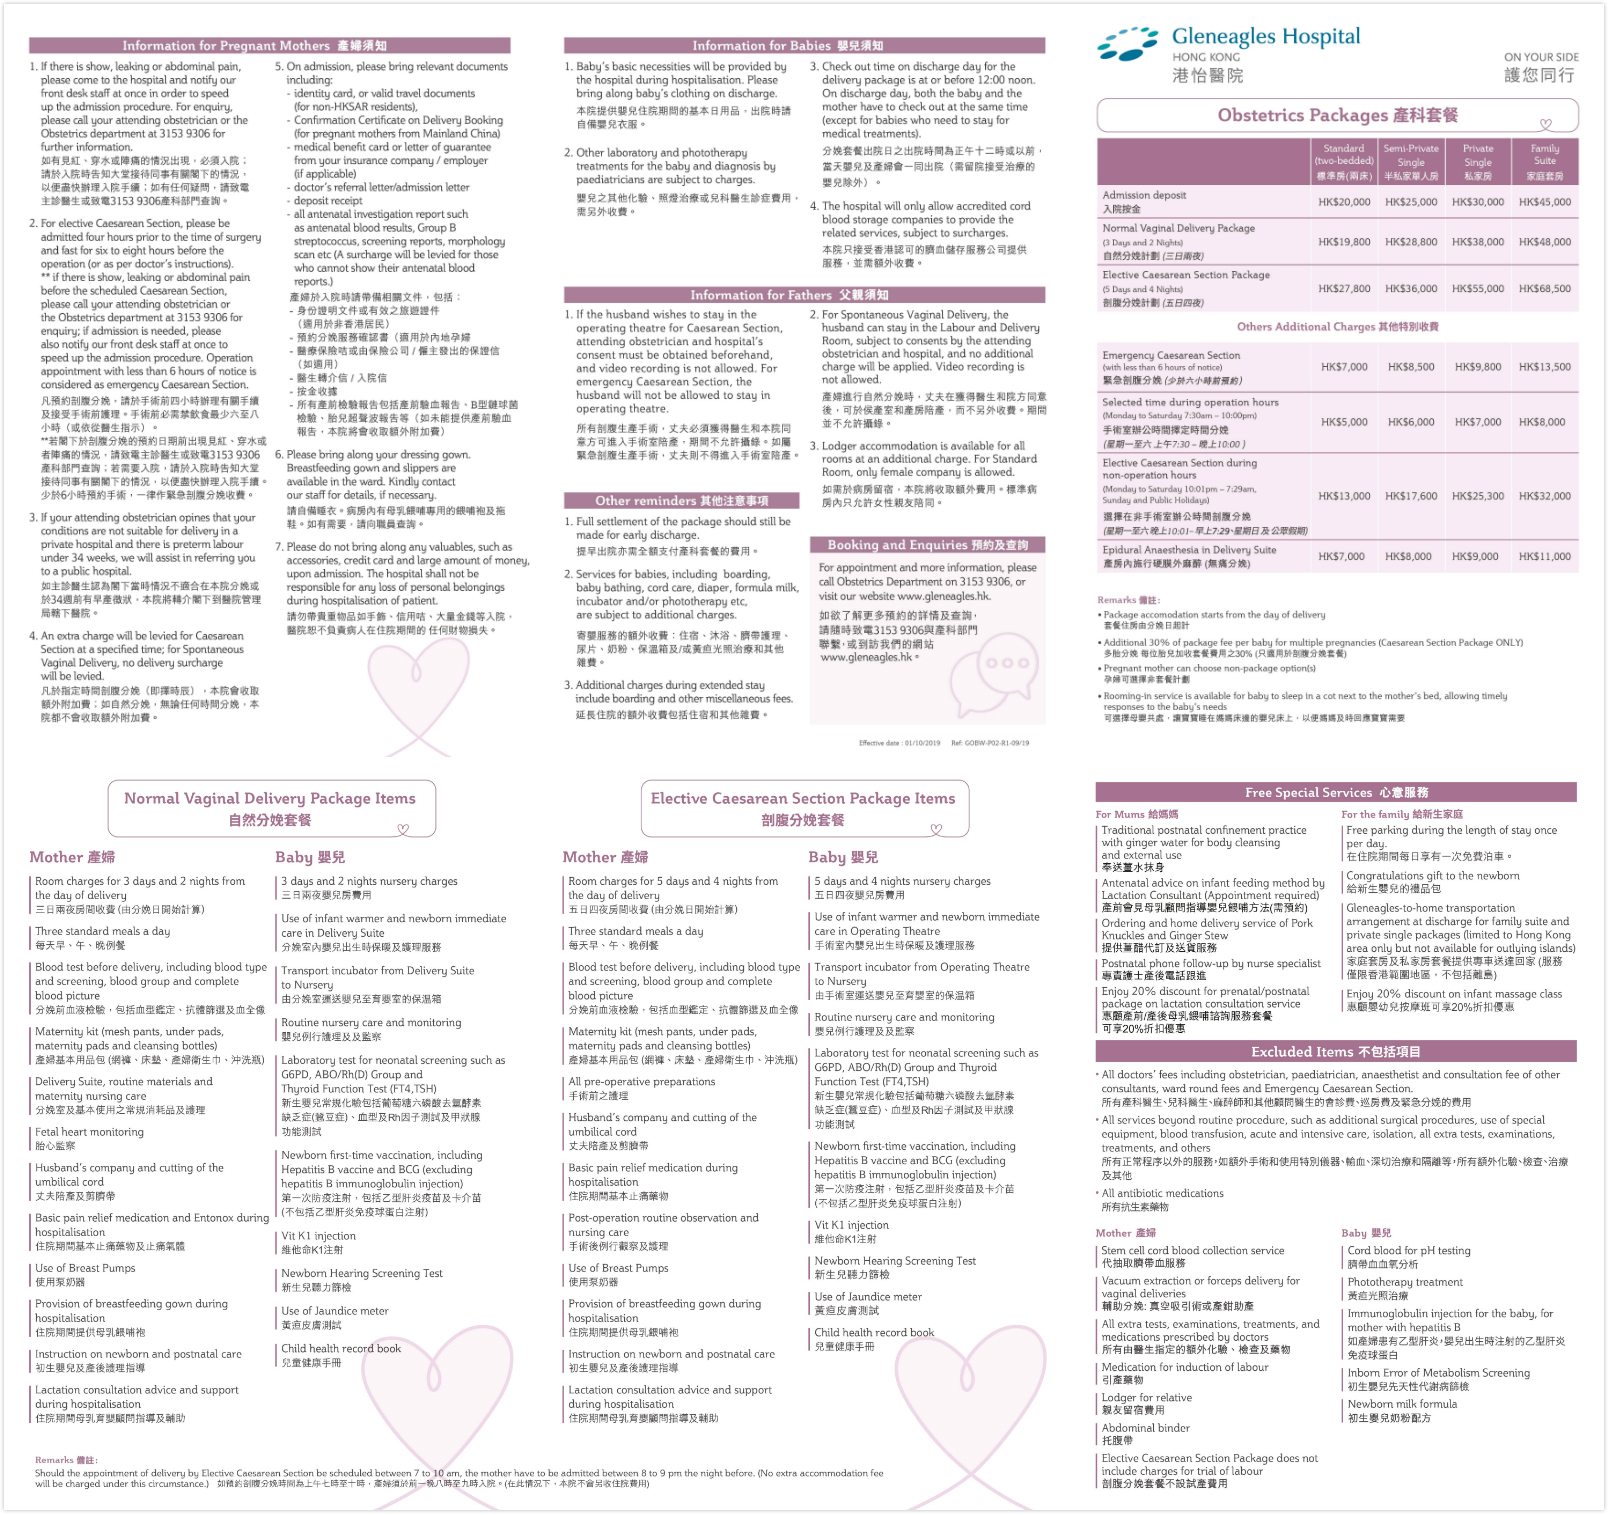 GOBW-P02-R1-09_19_Obstetrics-Services_Loose-Insert-Information_wef20191001_merged.jpg#asset:67132